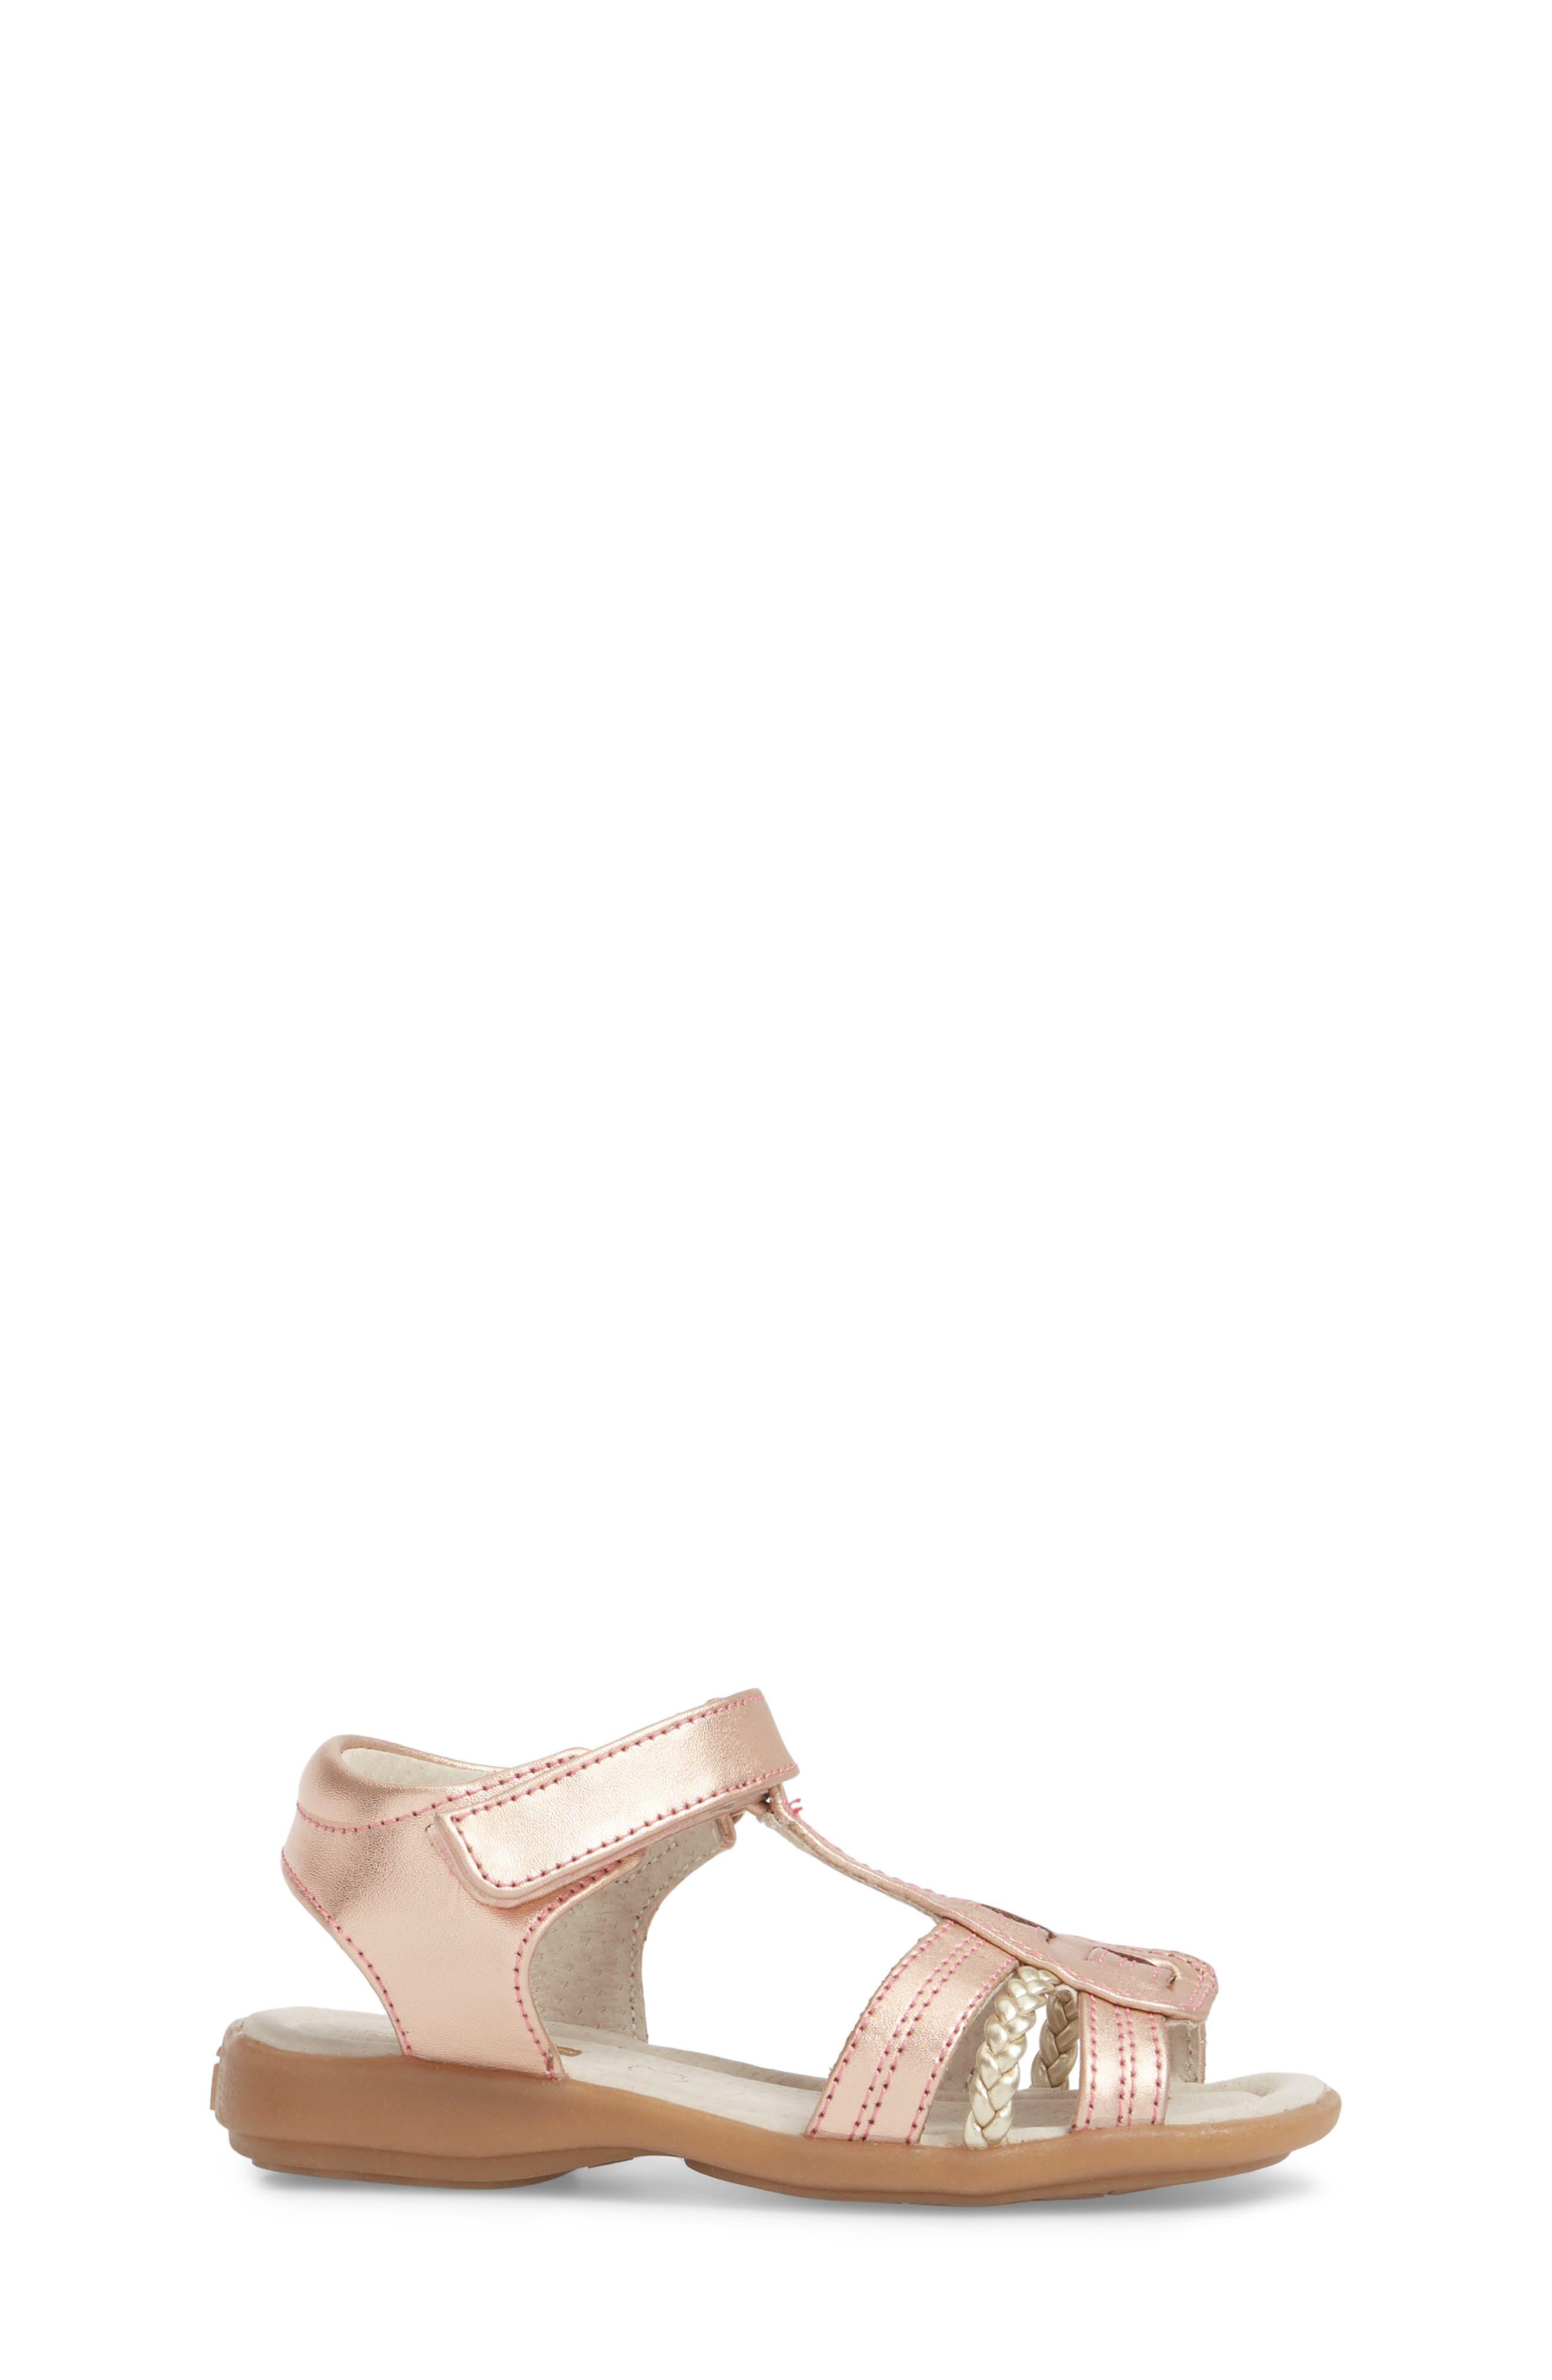 Hadley Metallic Sandal,                             Alternate thumbnail 3, color,                             040